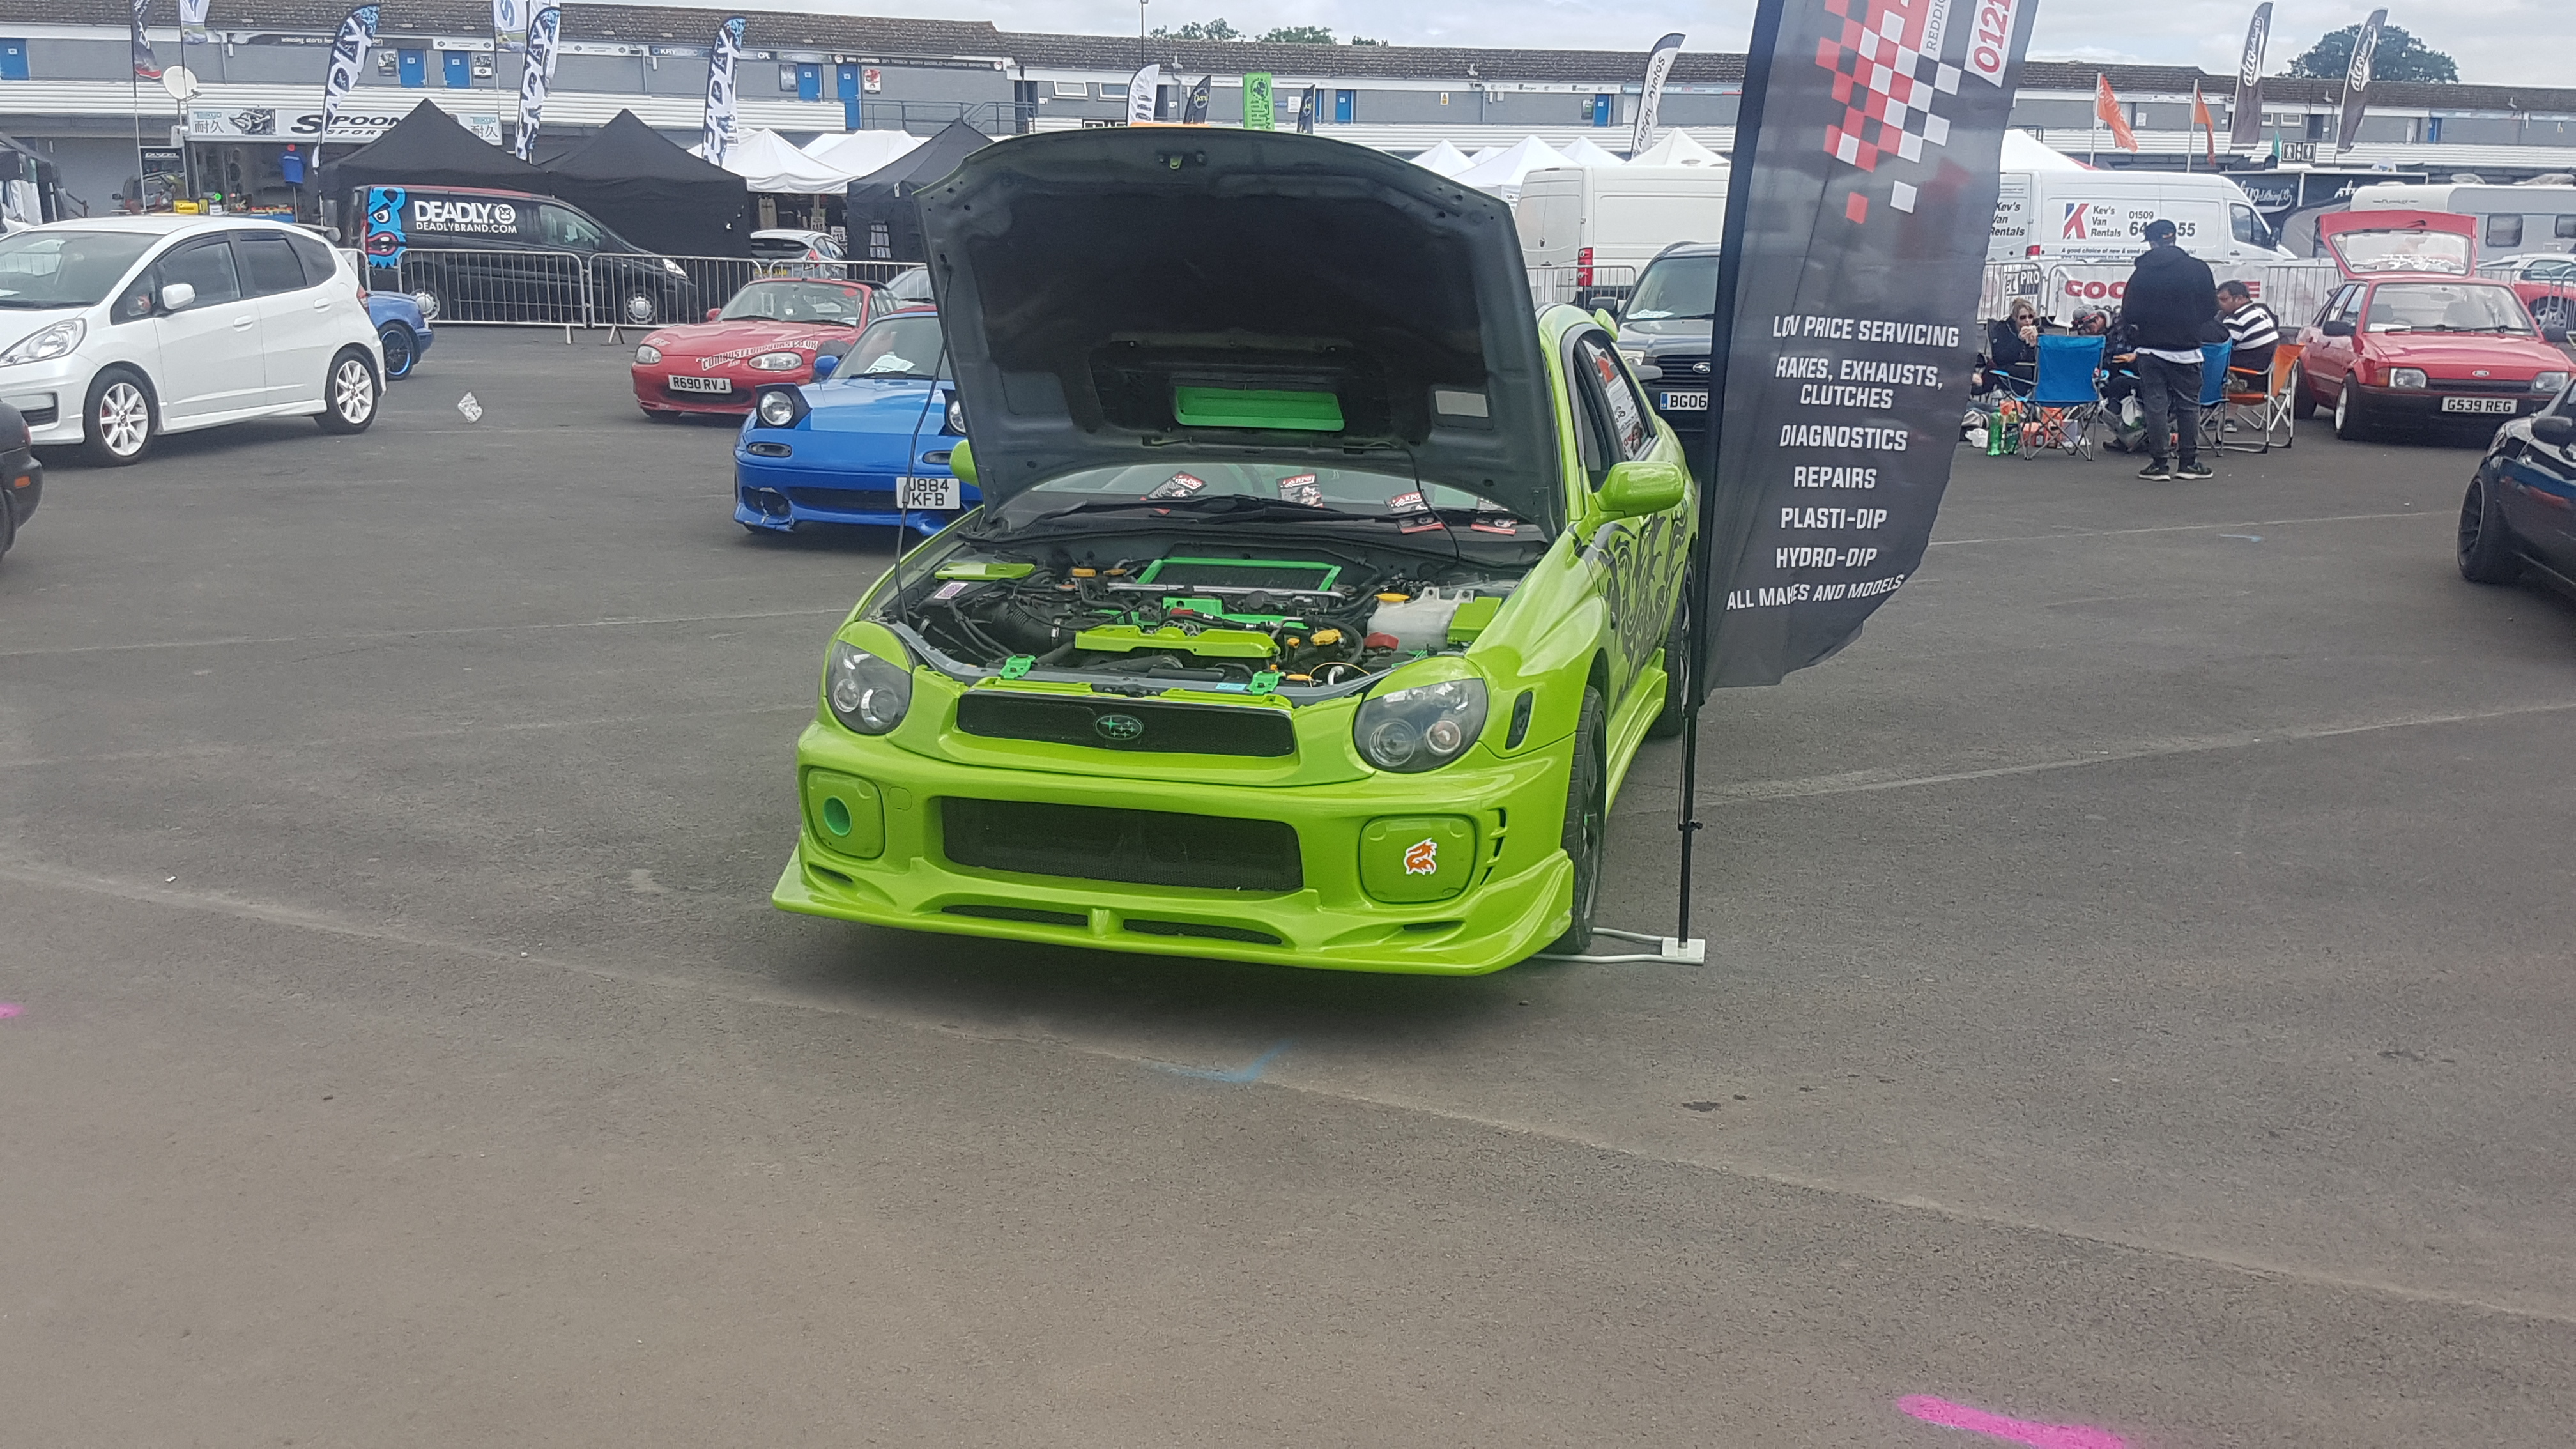 Subaru impreza WRX NBR - Member's Subarus For Sale - Subaru